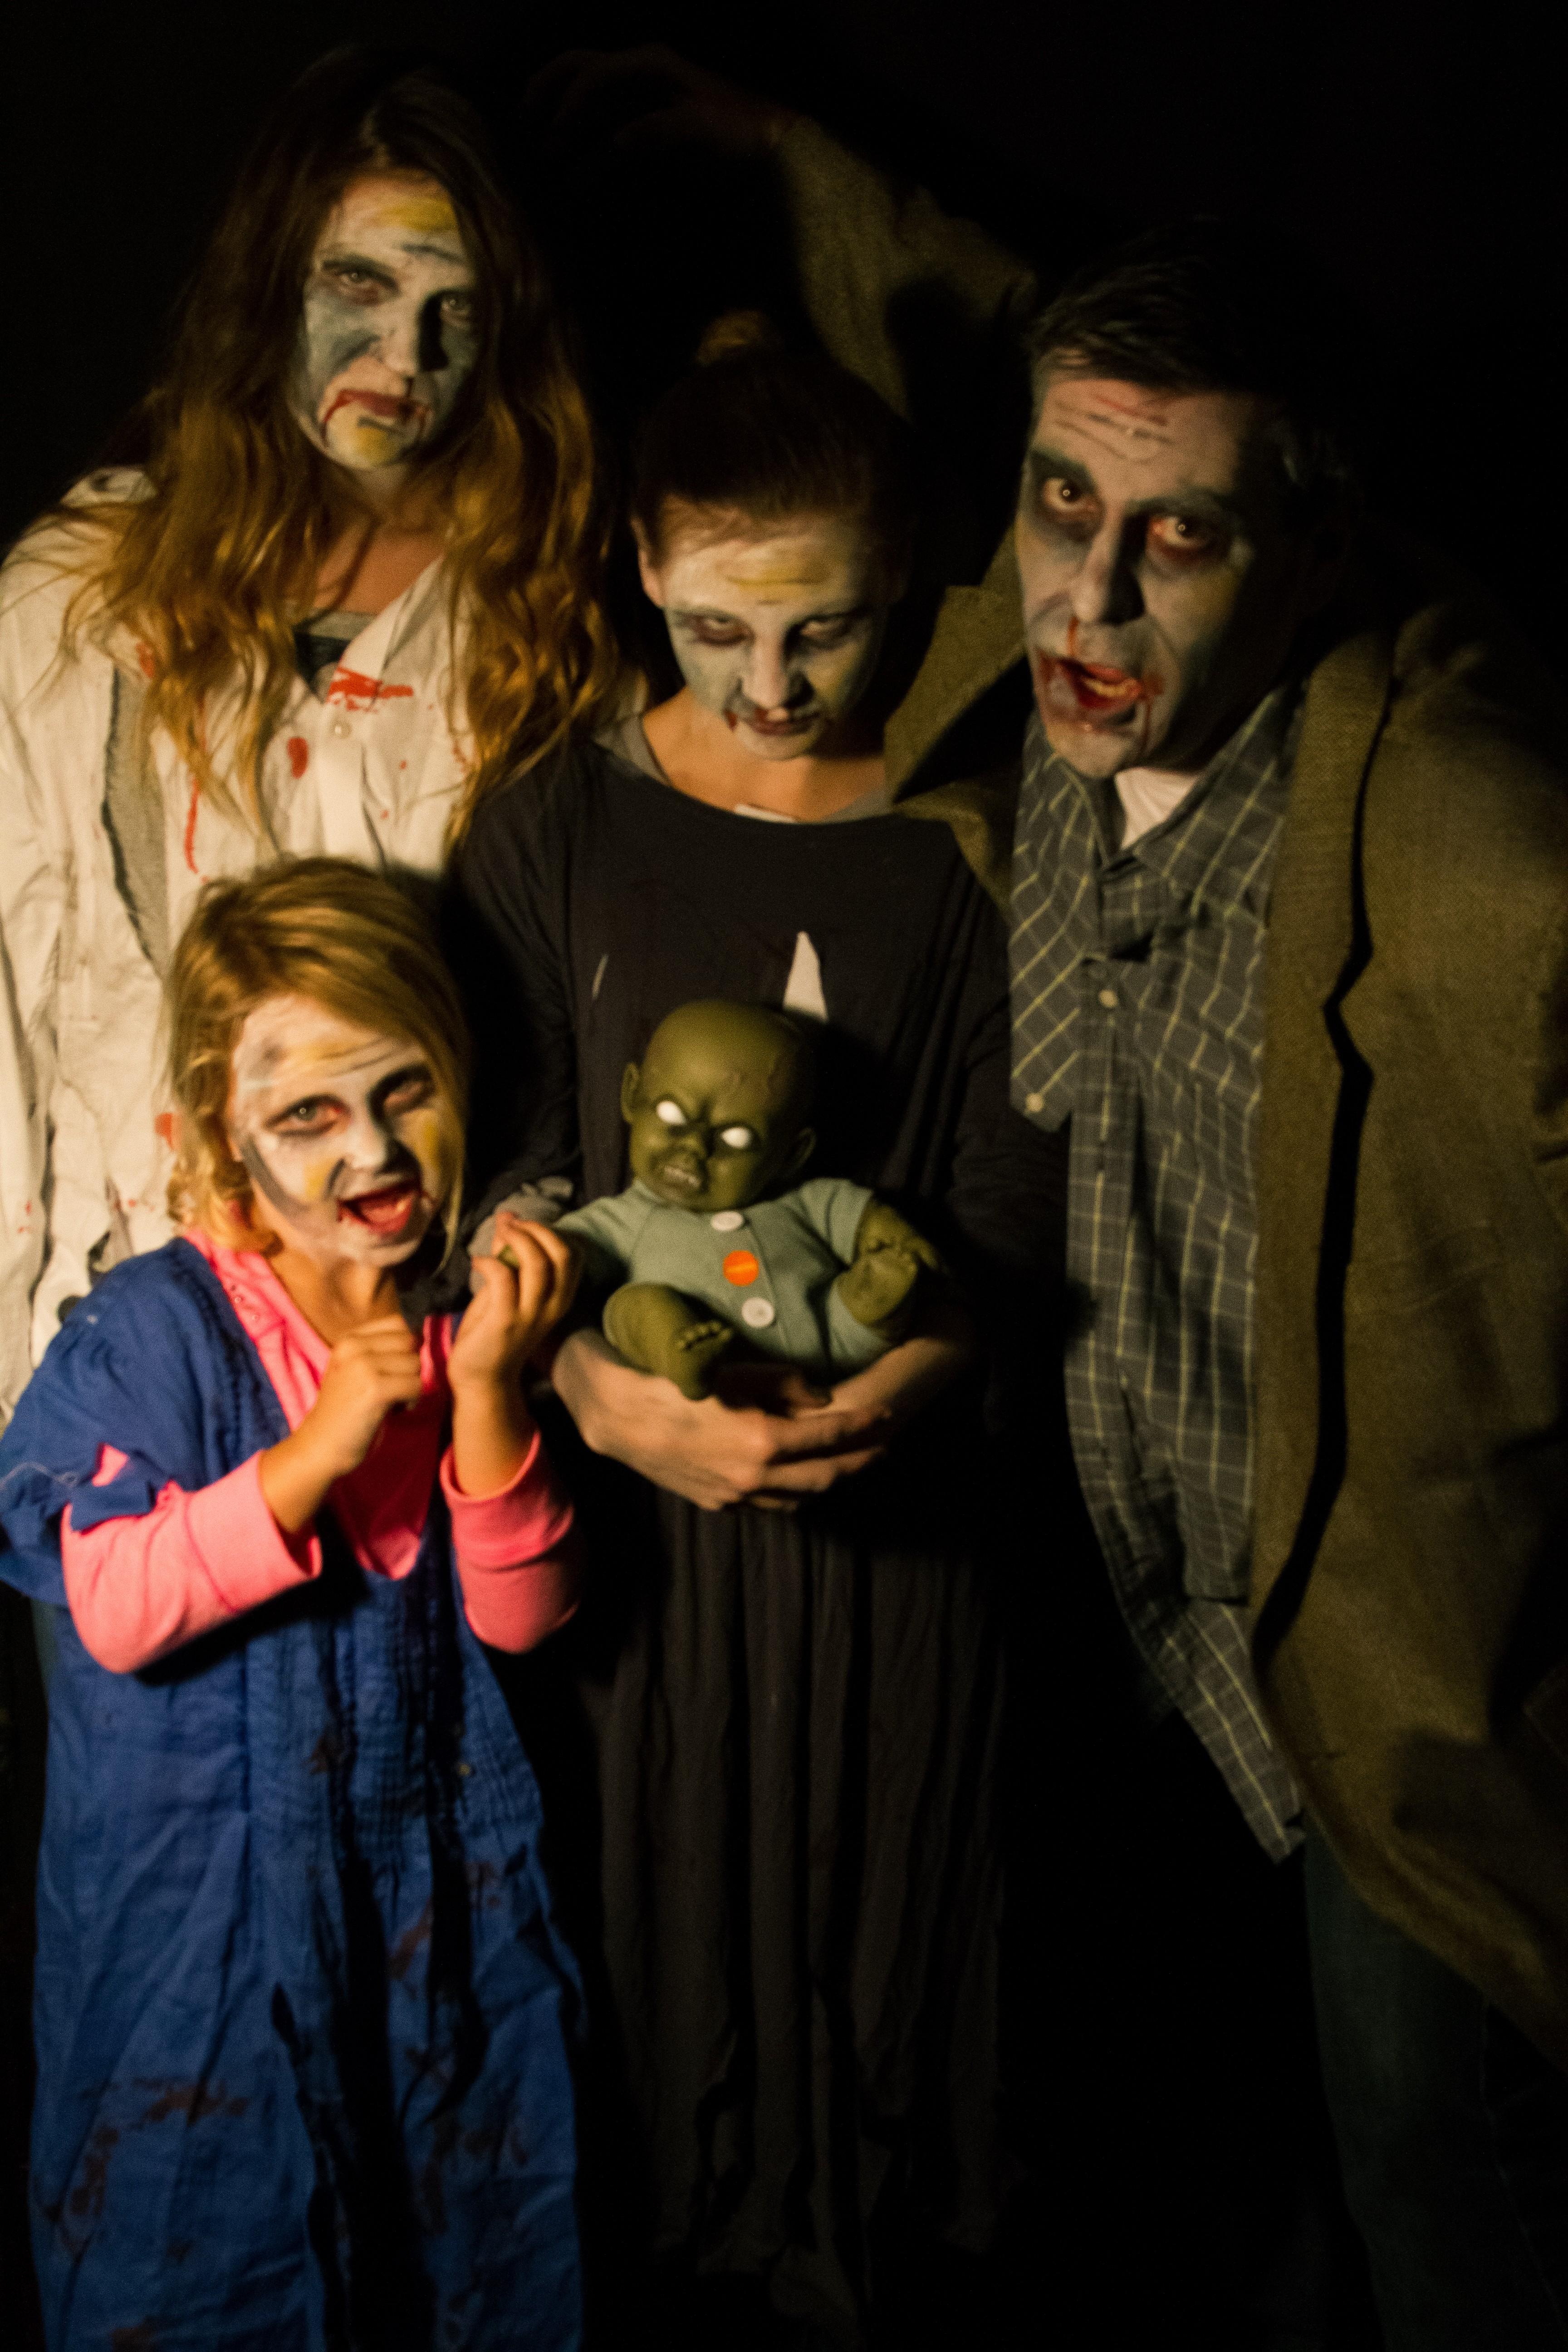 Tendenci Zombie Photos 2013 - 7